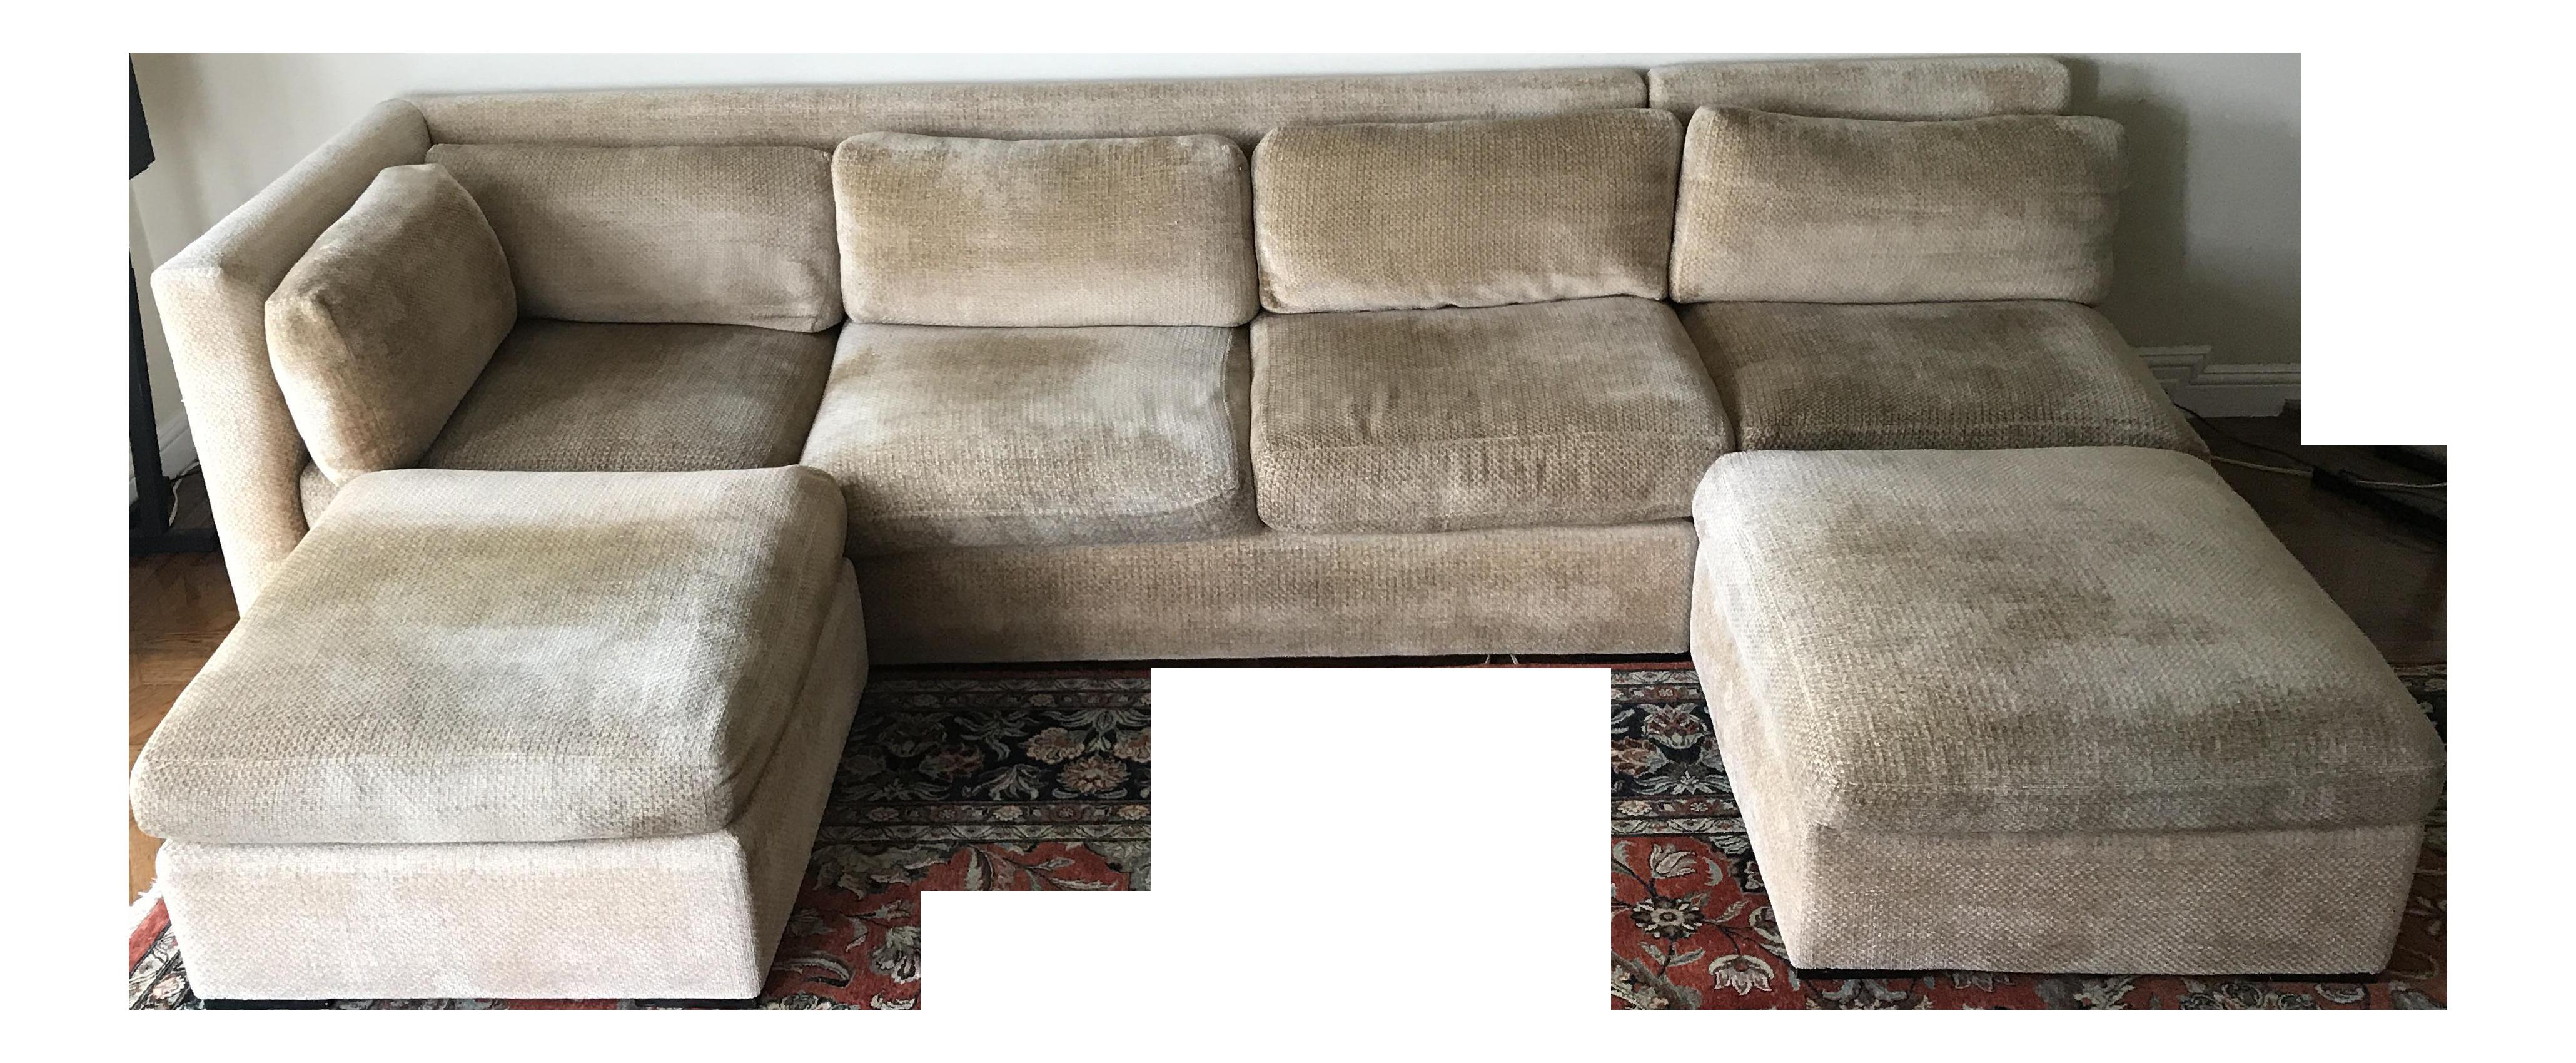 Kreiss Custom Sectional Couch